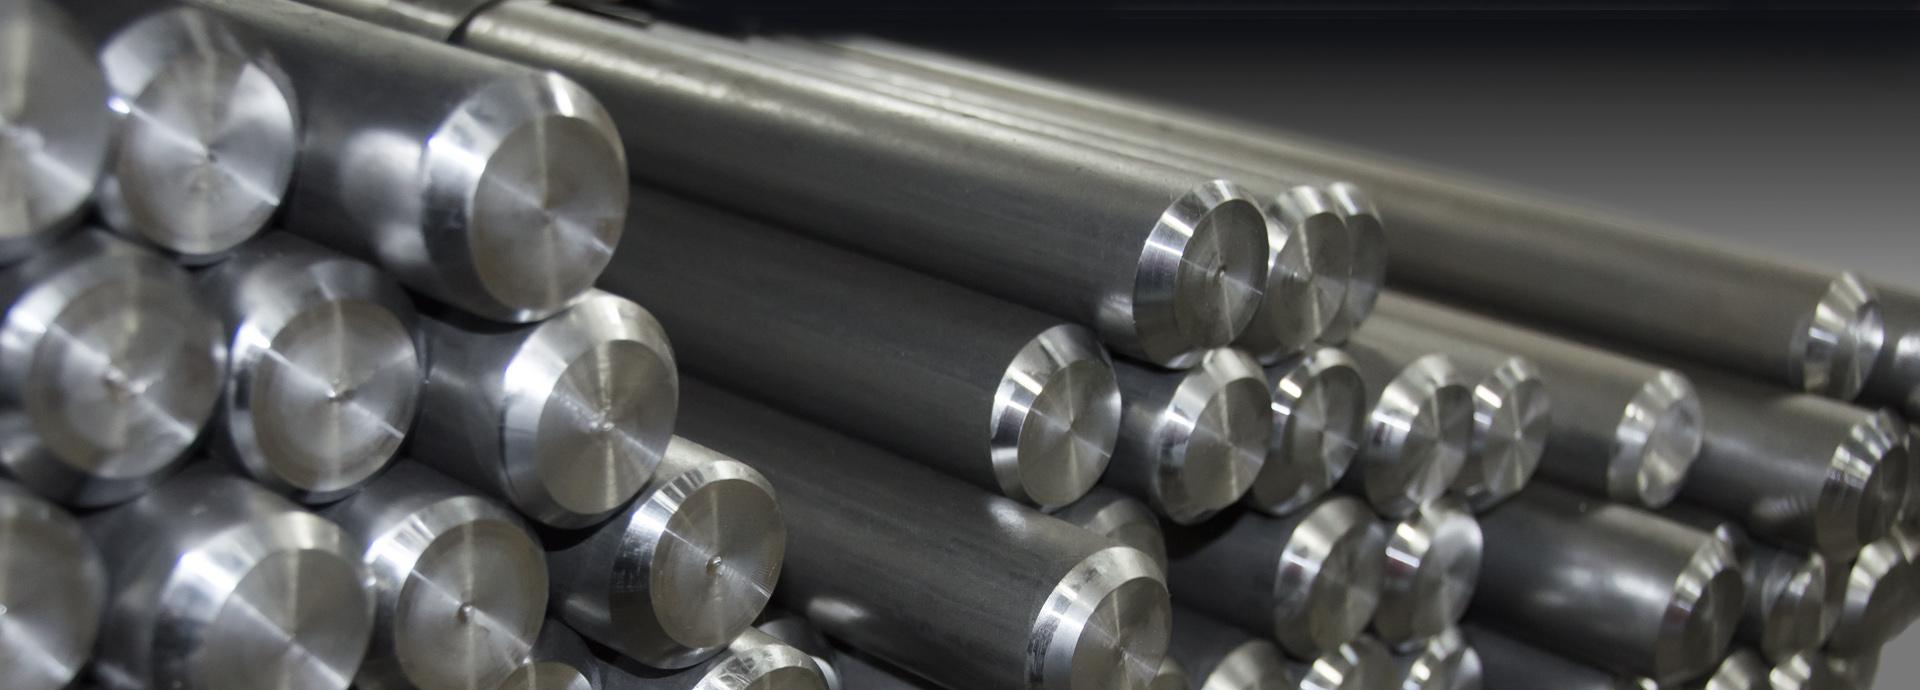 Material Machining | Horschel Brothers Precision - Springville, New York